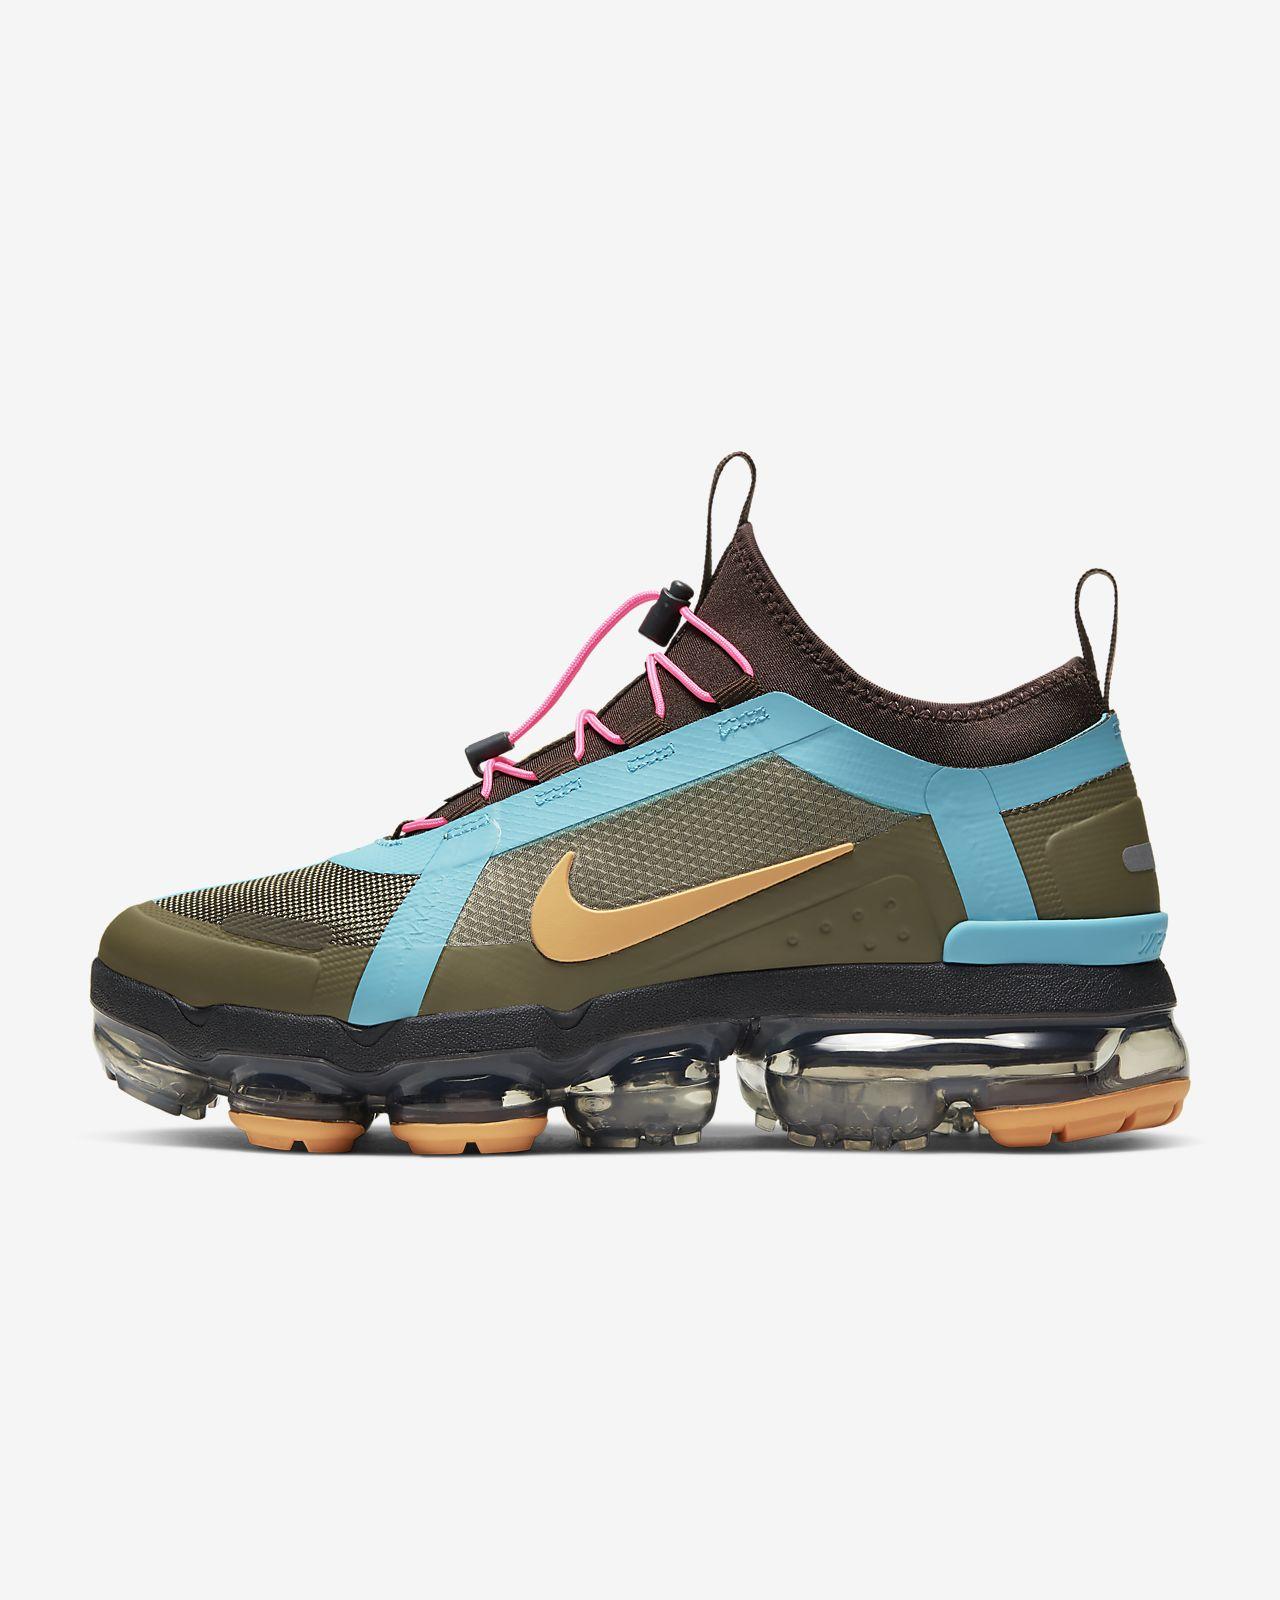 Nike Air VaporMax 2019 Utility 女子运动鞋